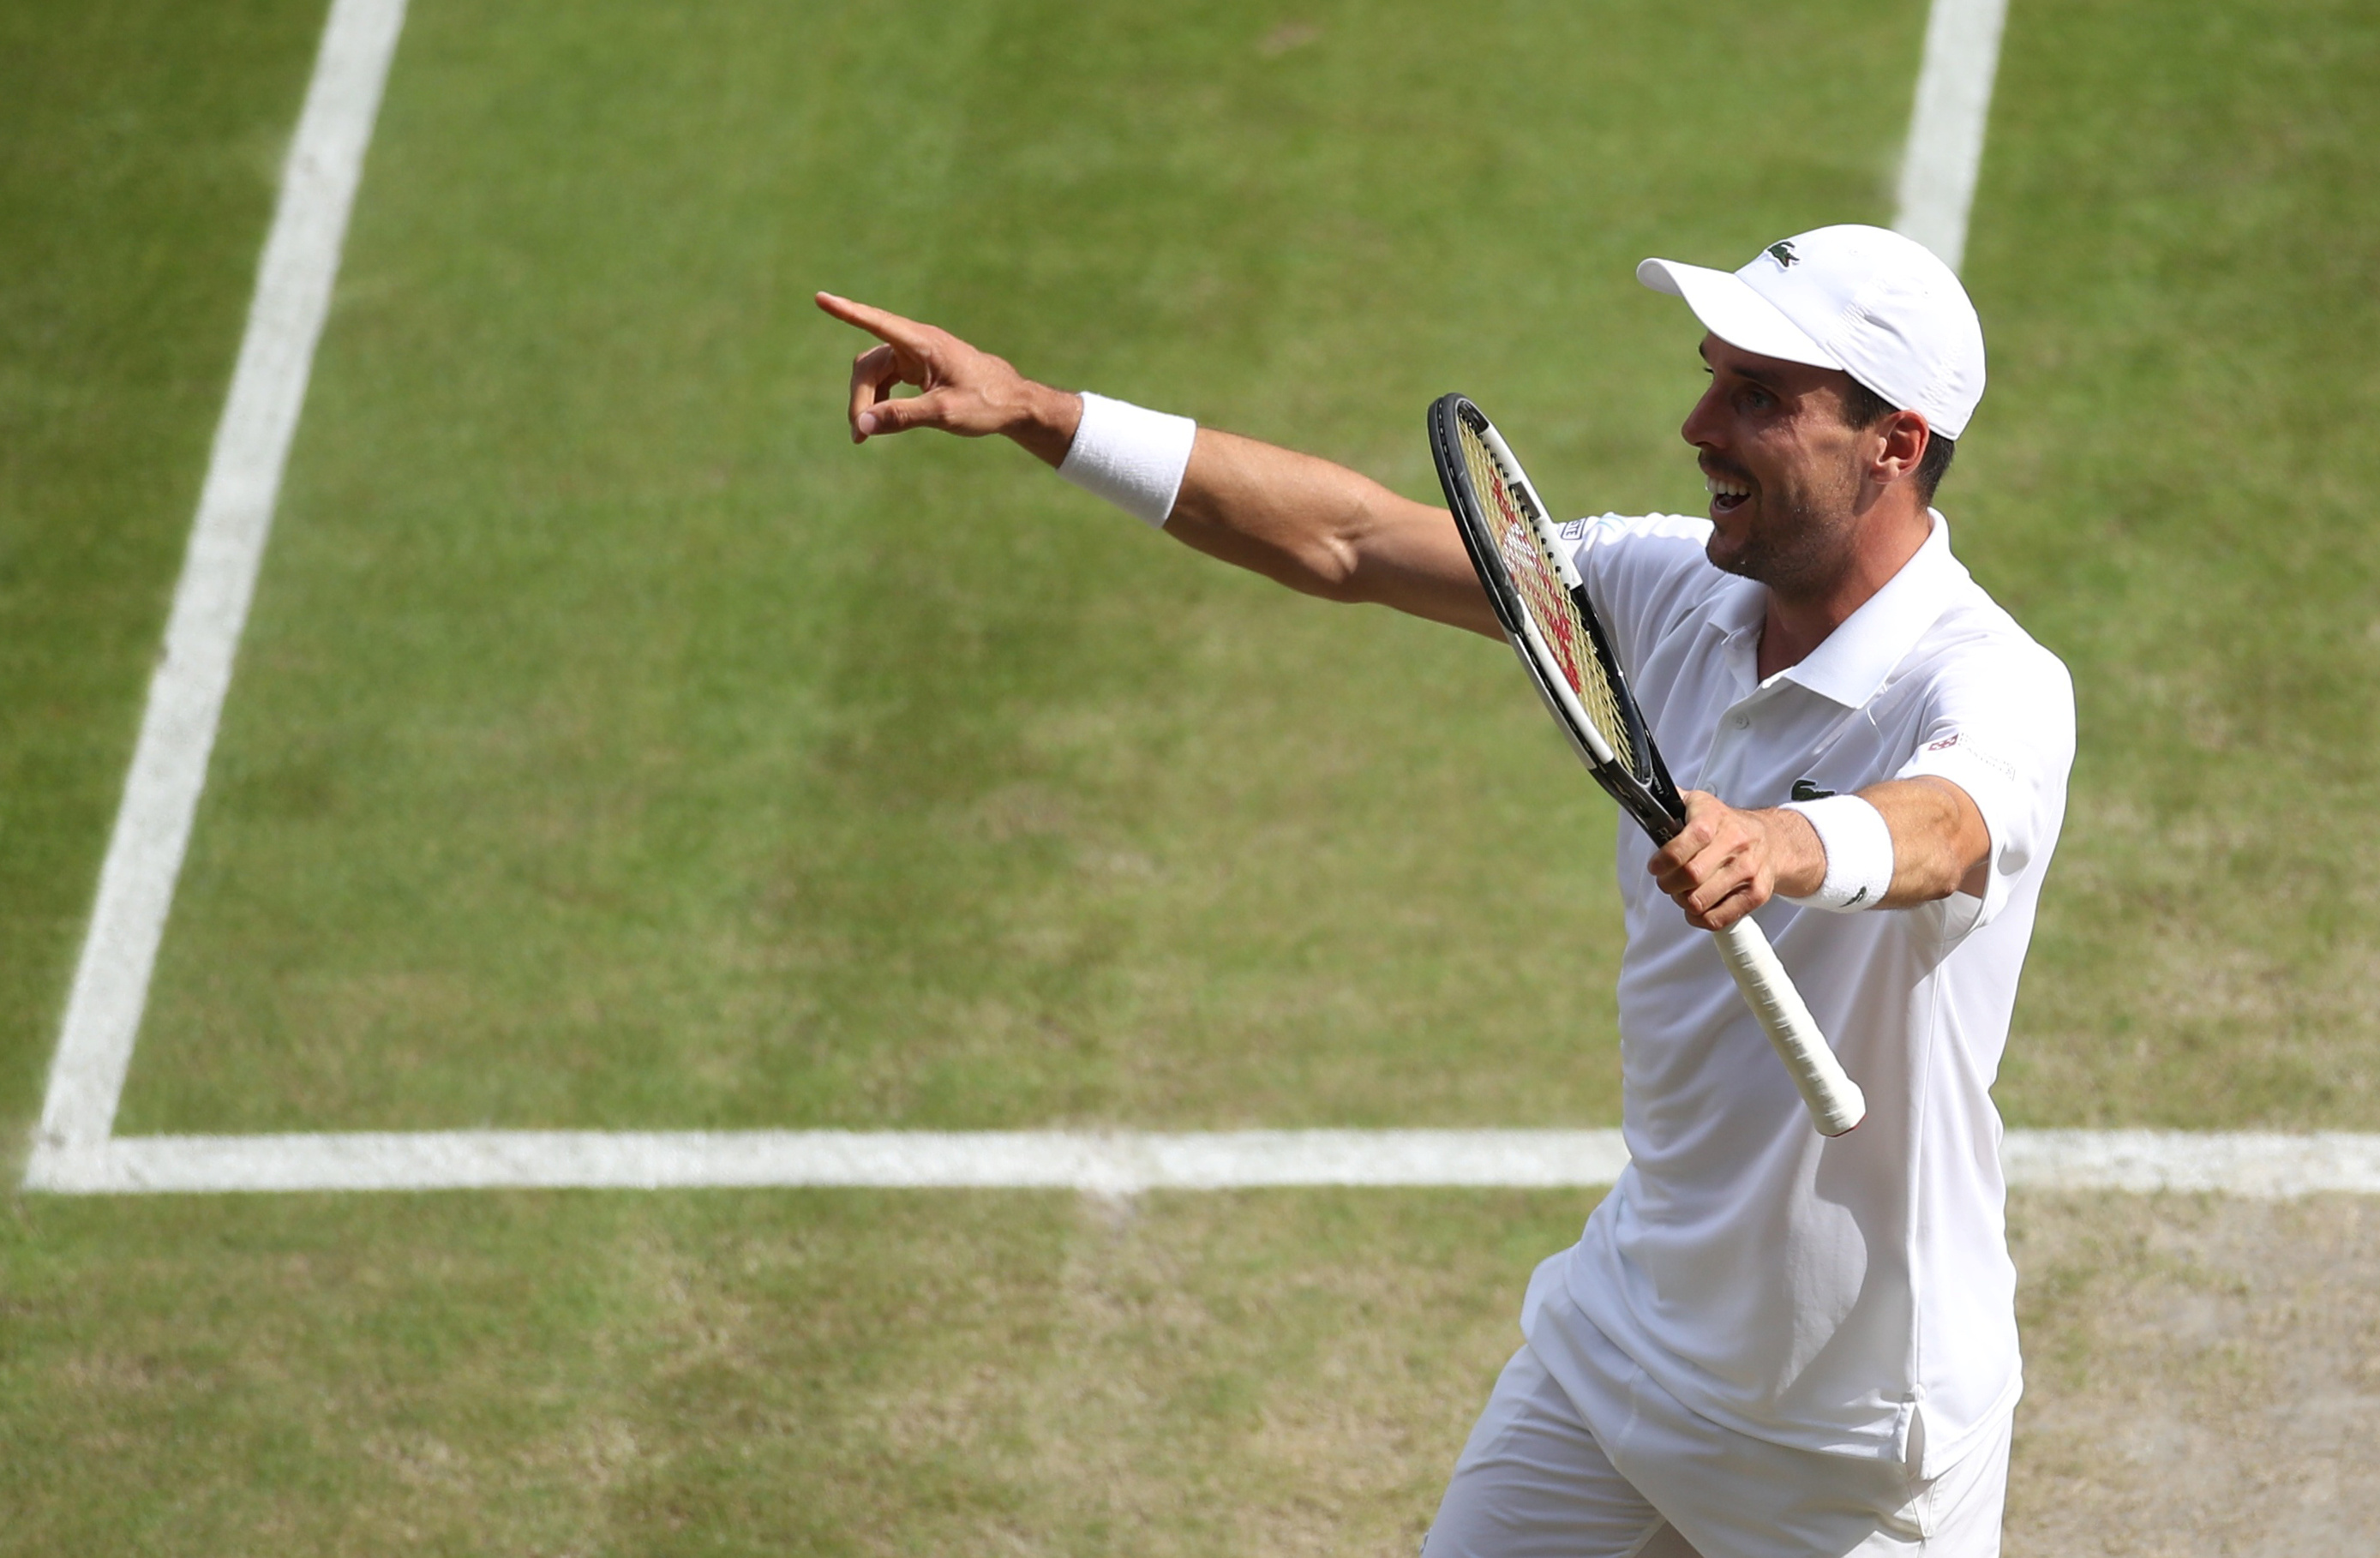 Tennis - Wimbledon - Ibiza, Villarreal, surfaces rapides... 5 choses à savoir sur Bautista Agut, l'adversaire de Novak Djokovic